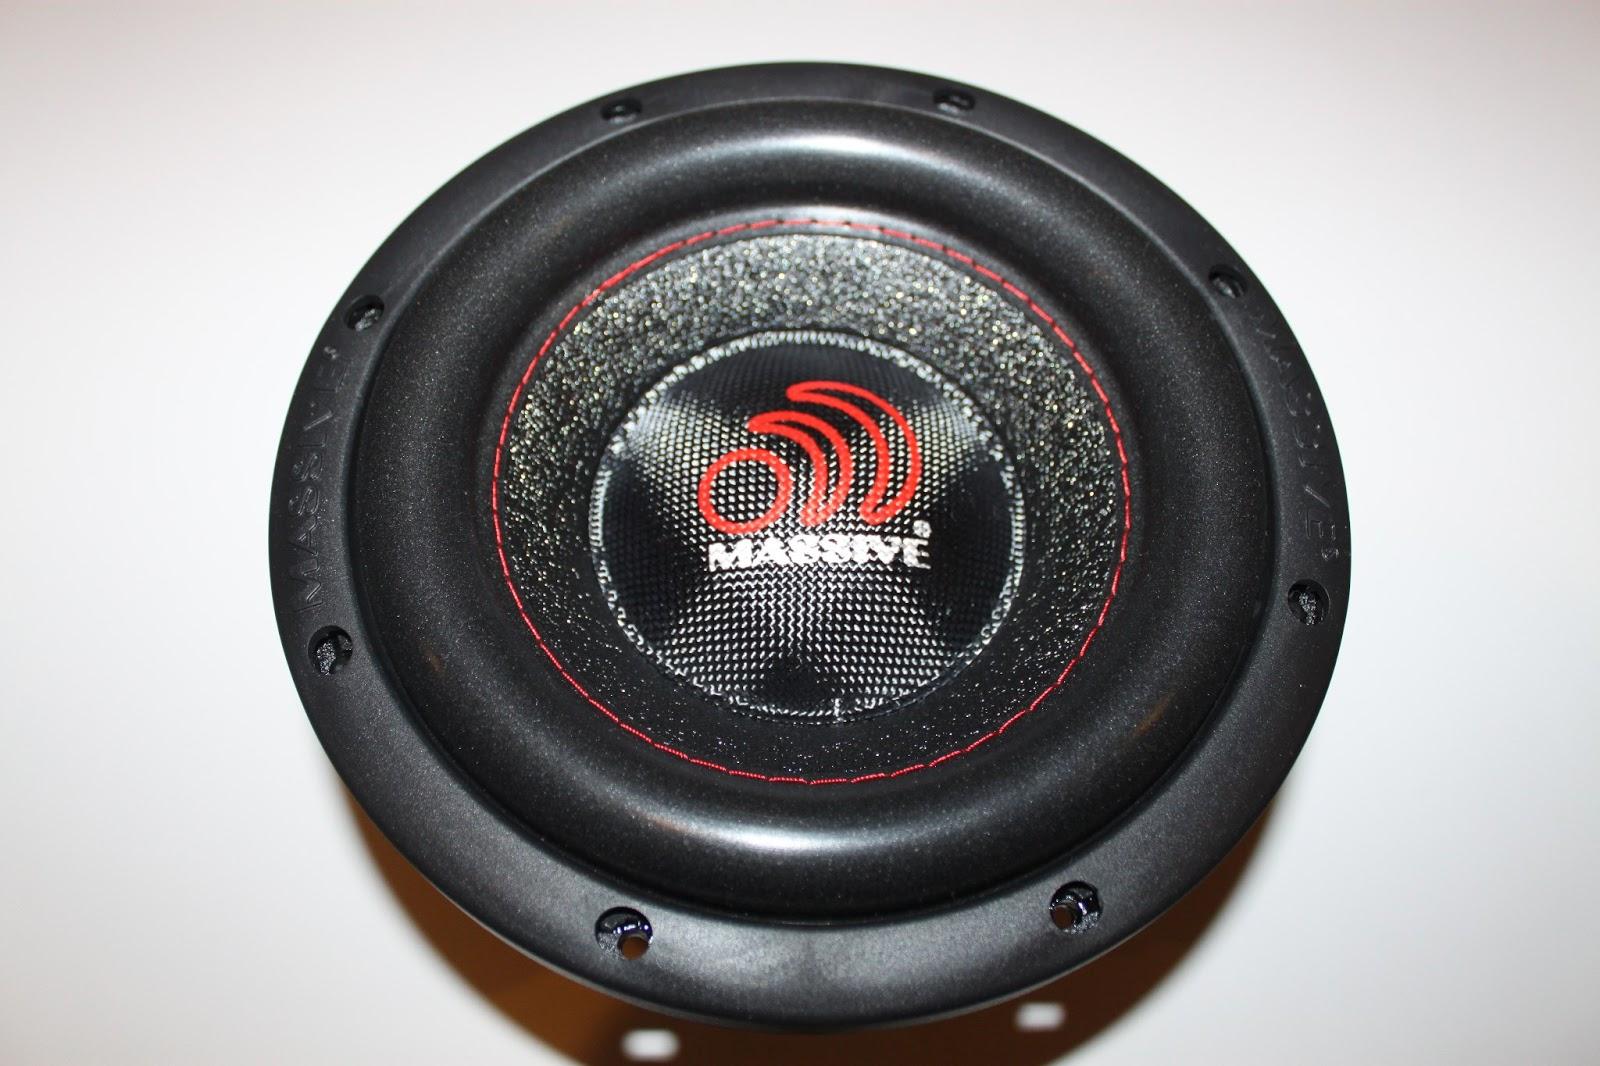 Stereowise Plus Massive Audio Hippo 84 Dual 4ohm